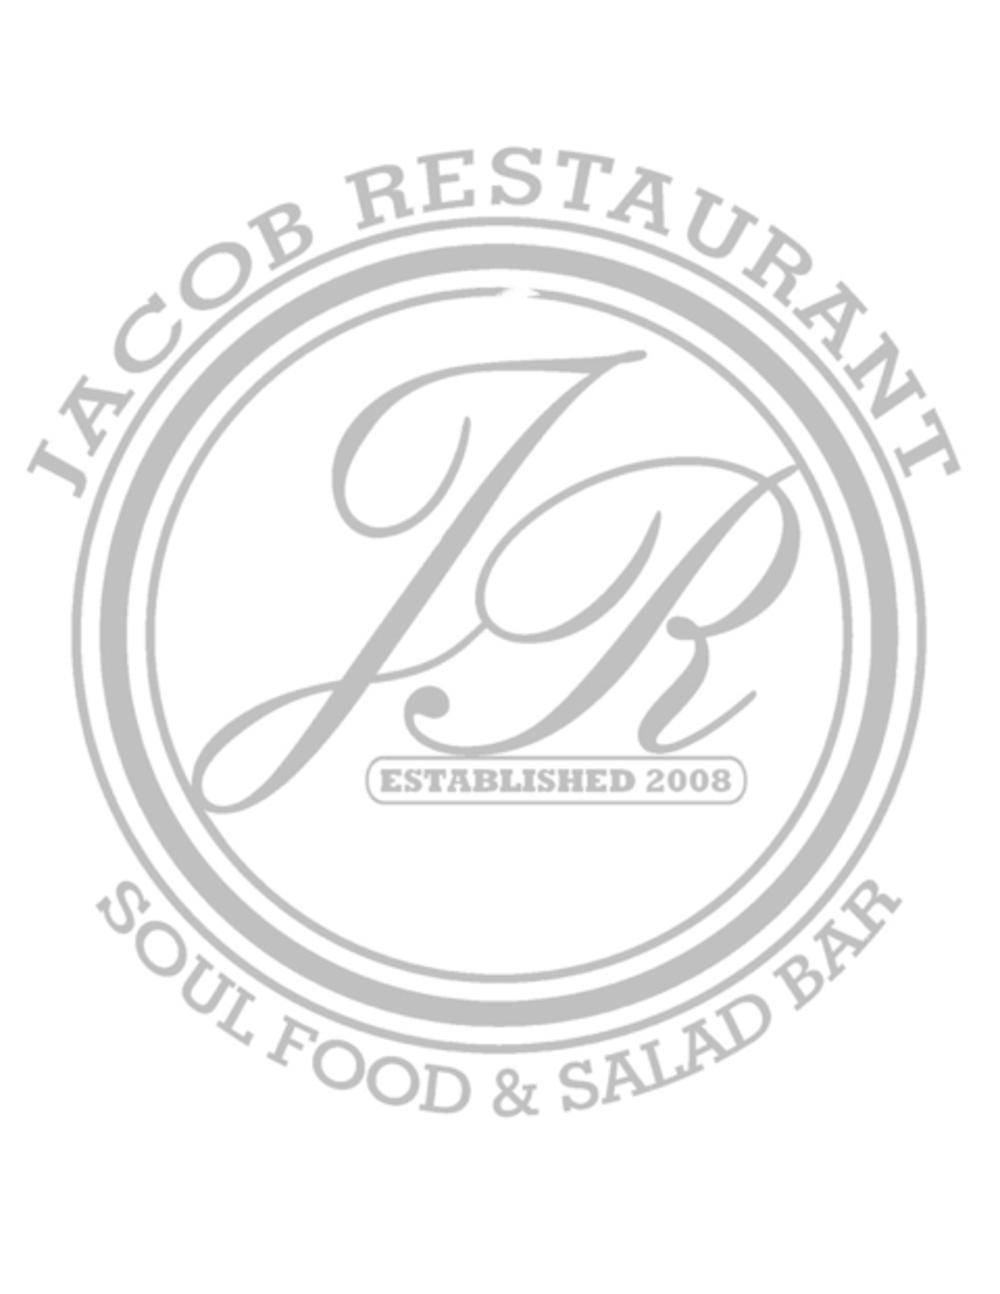 JacobRestaurantlogo-page-001.jpg